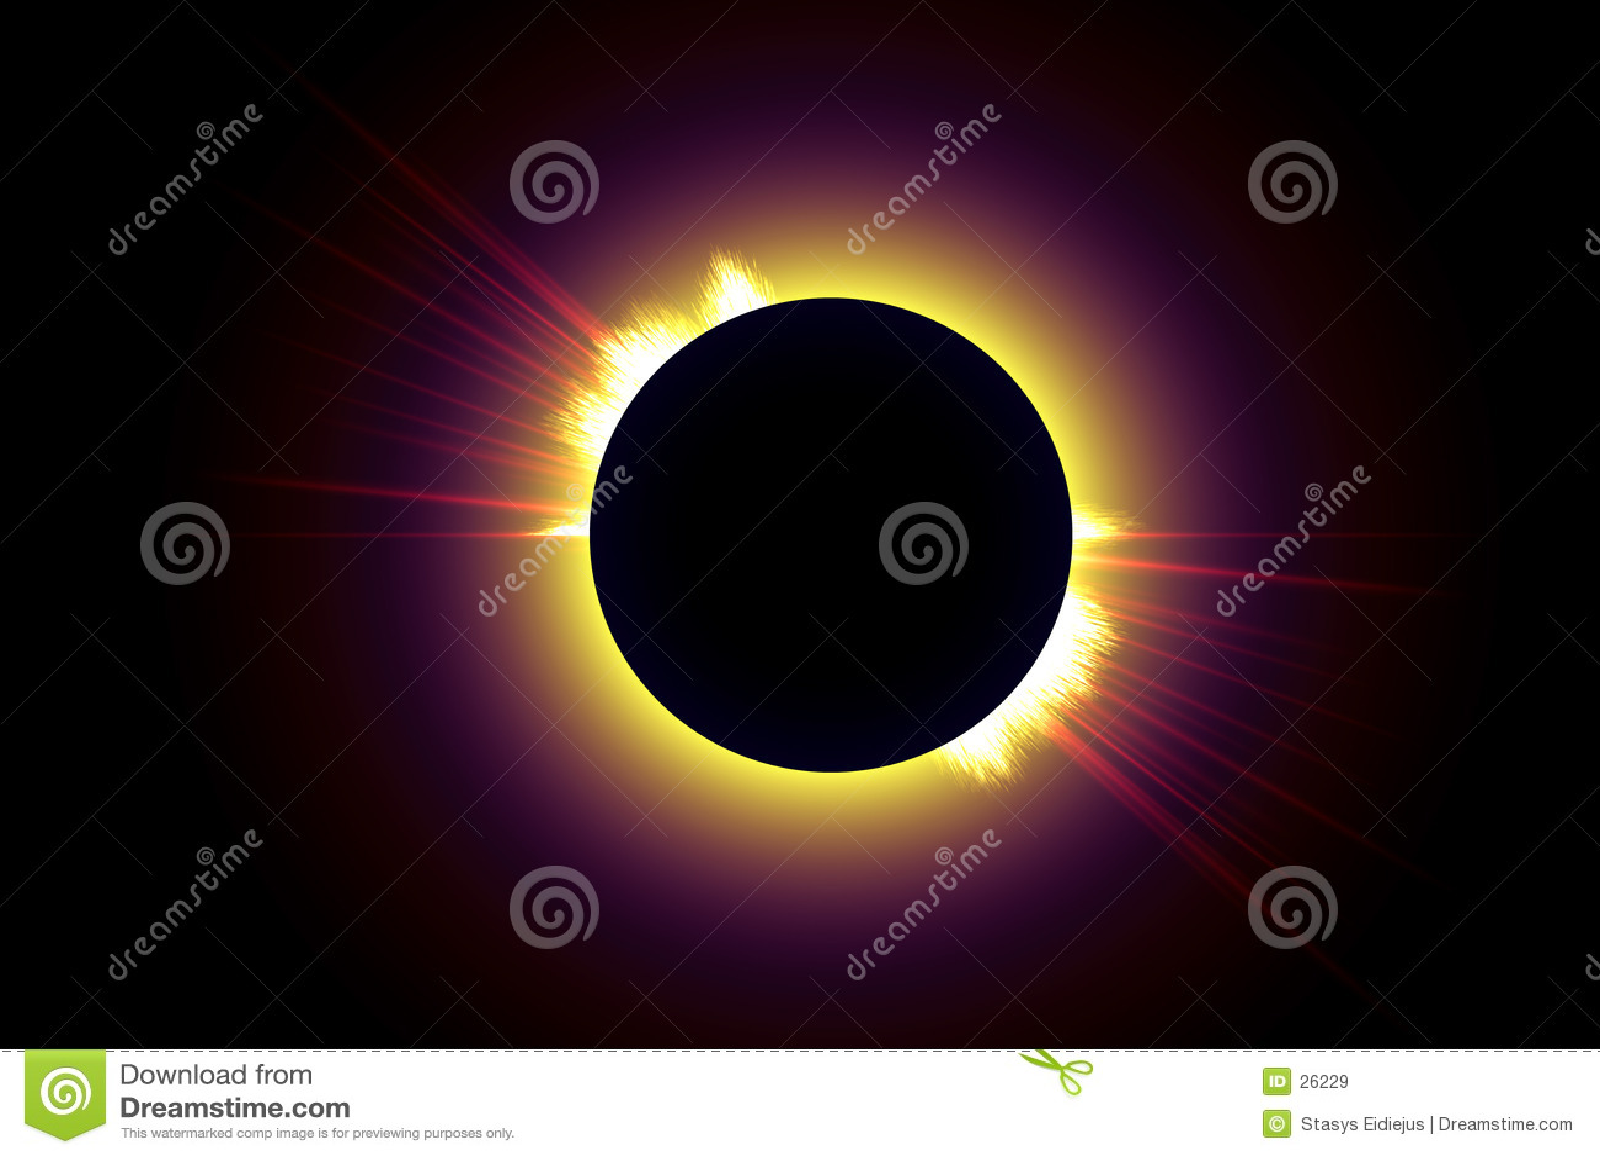 Total eclipse II